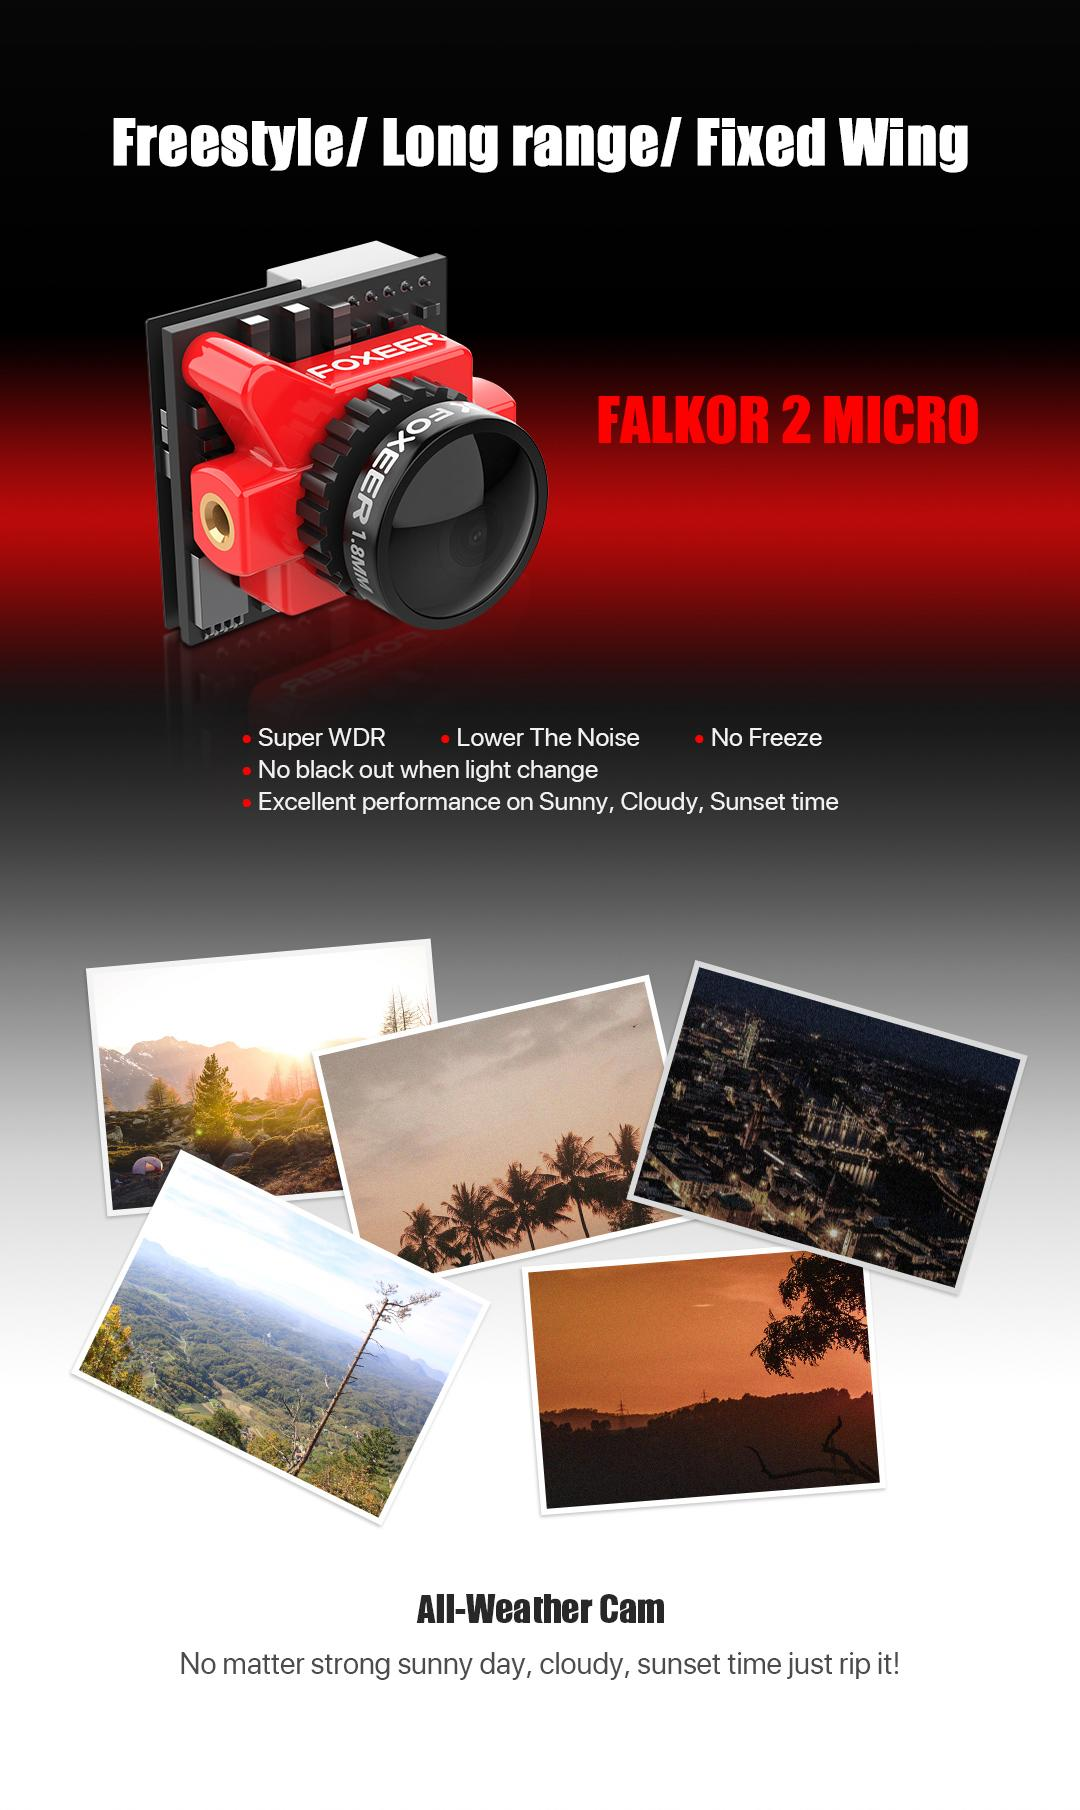 falkor-2-micro1.jpg